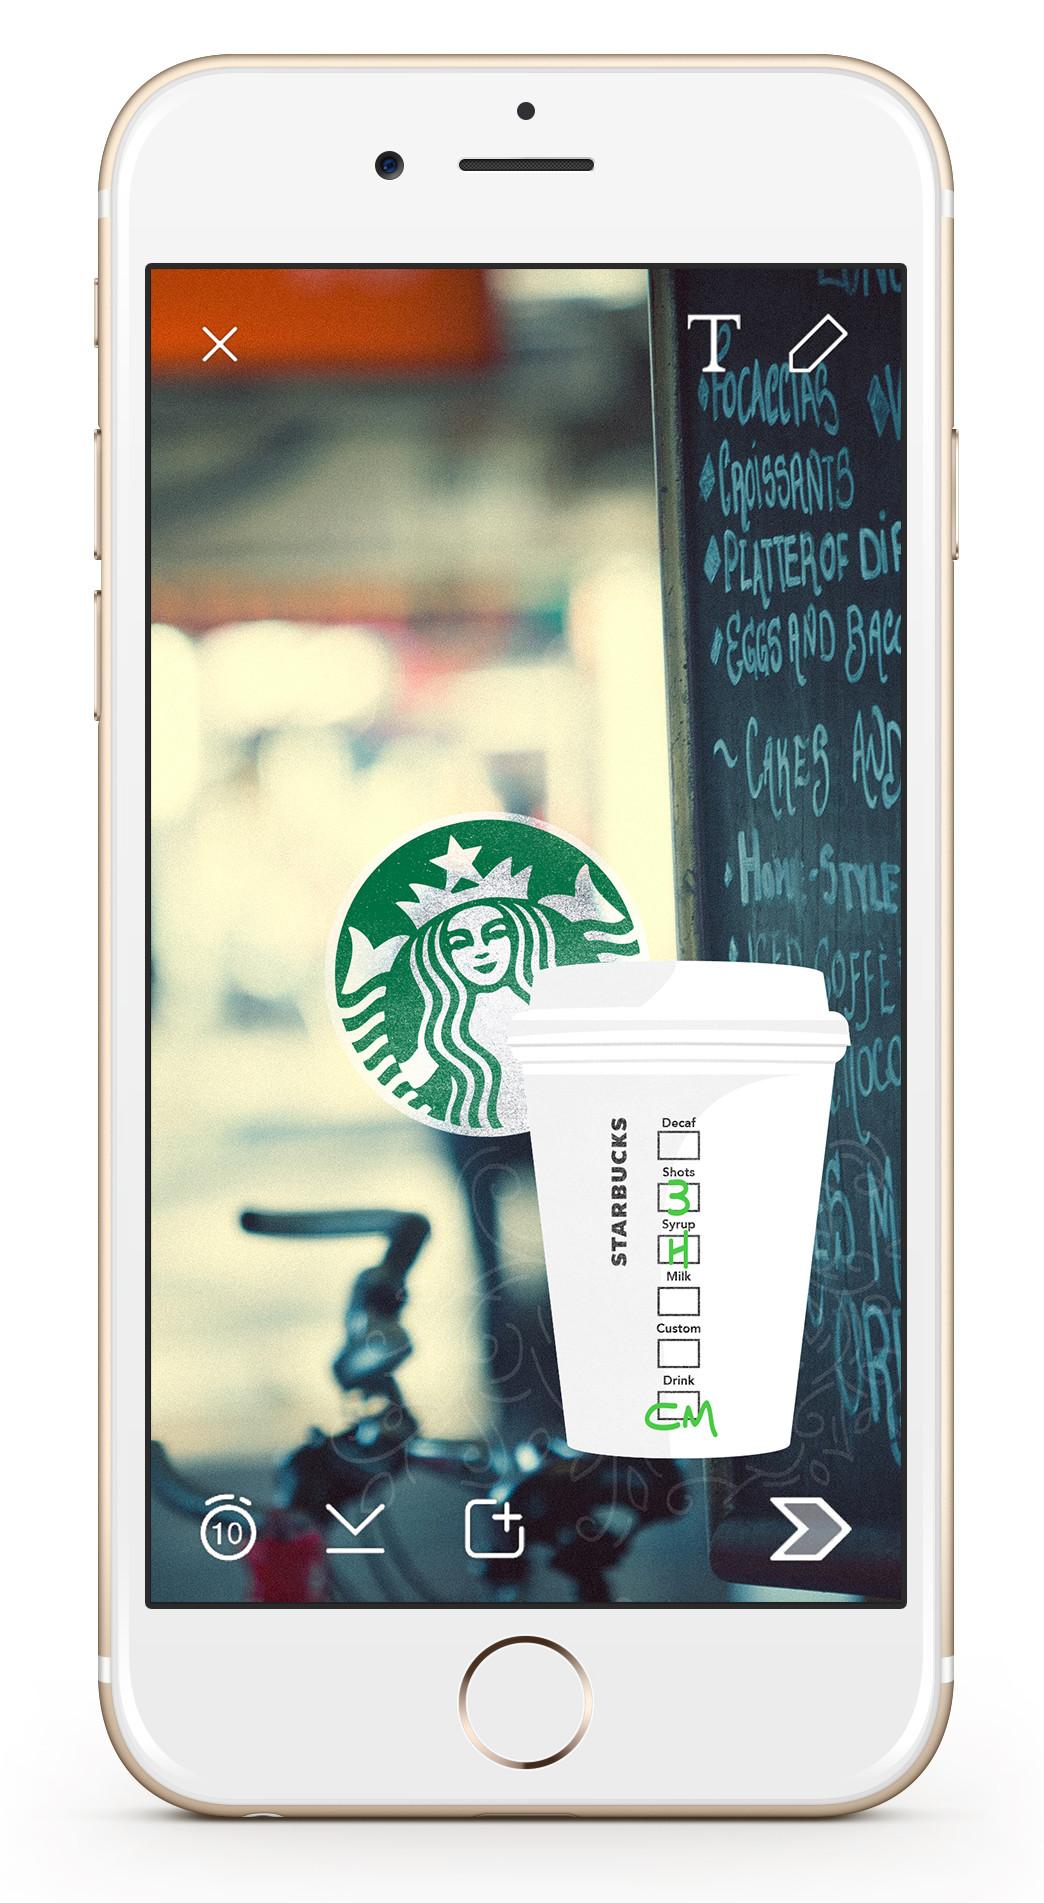 iPhone-Iso-Starbucks-e1436909688698